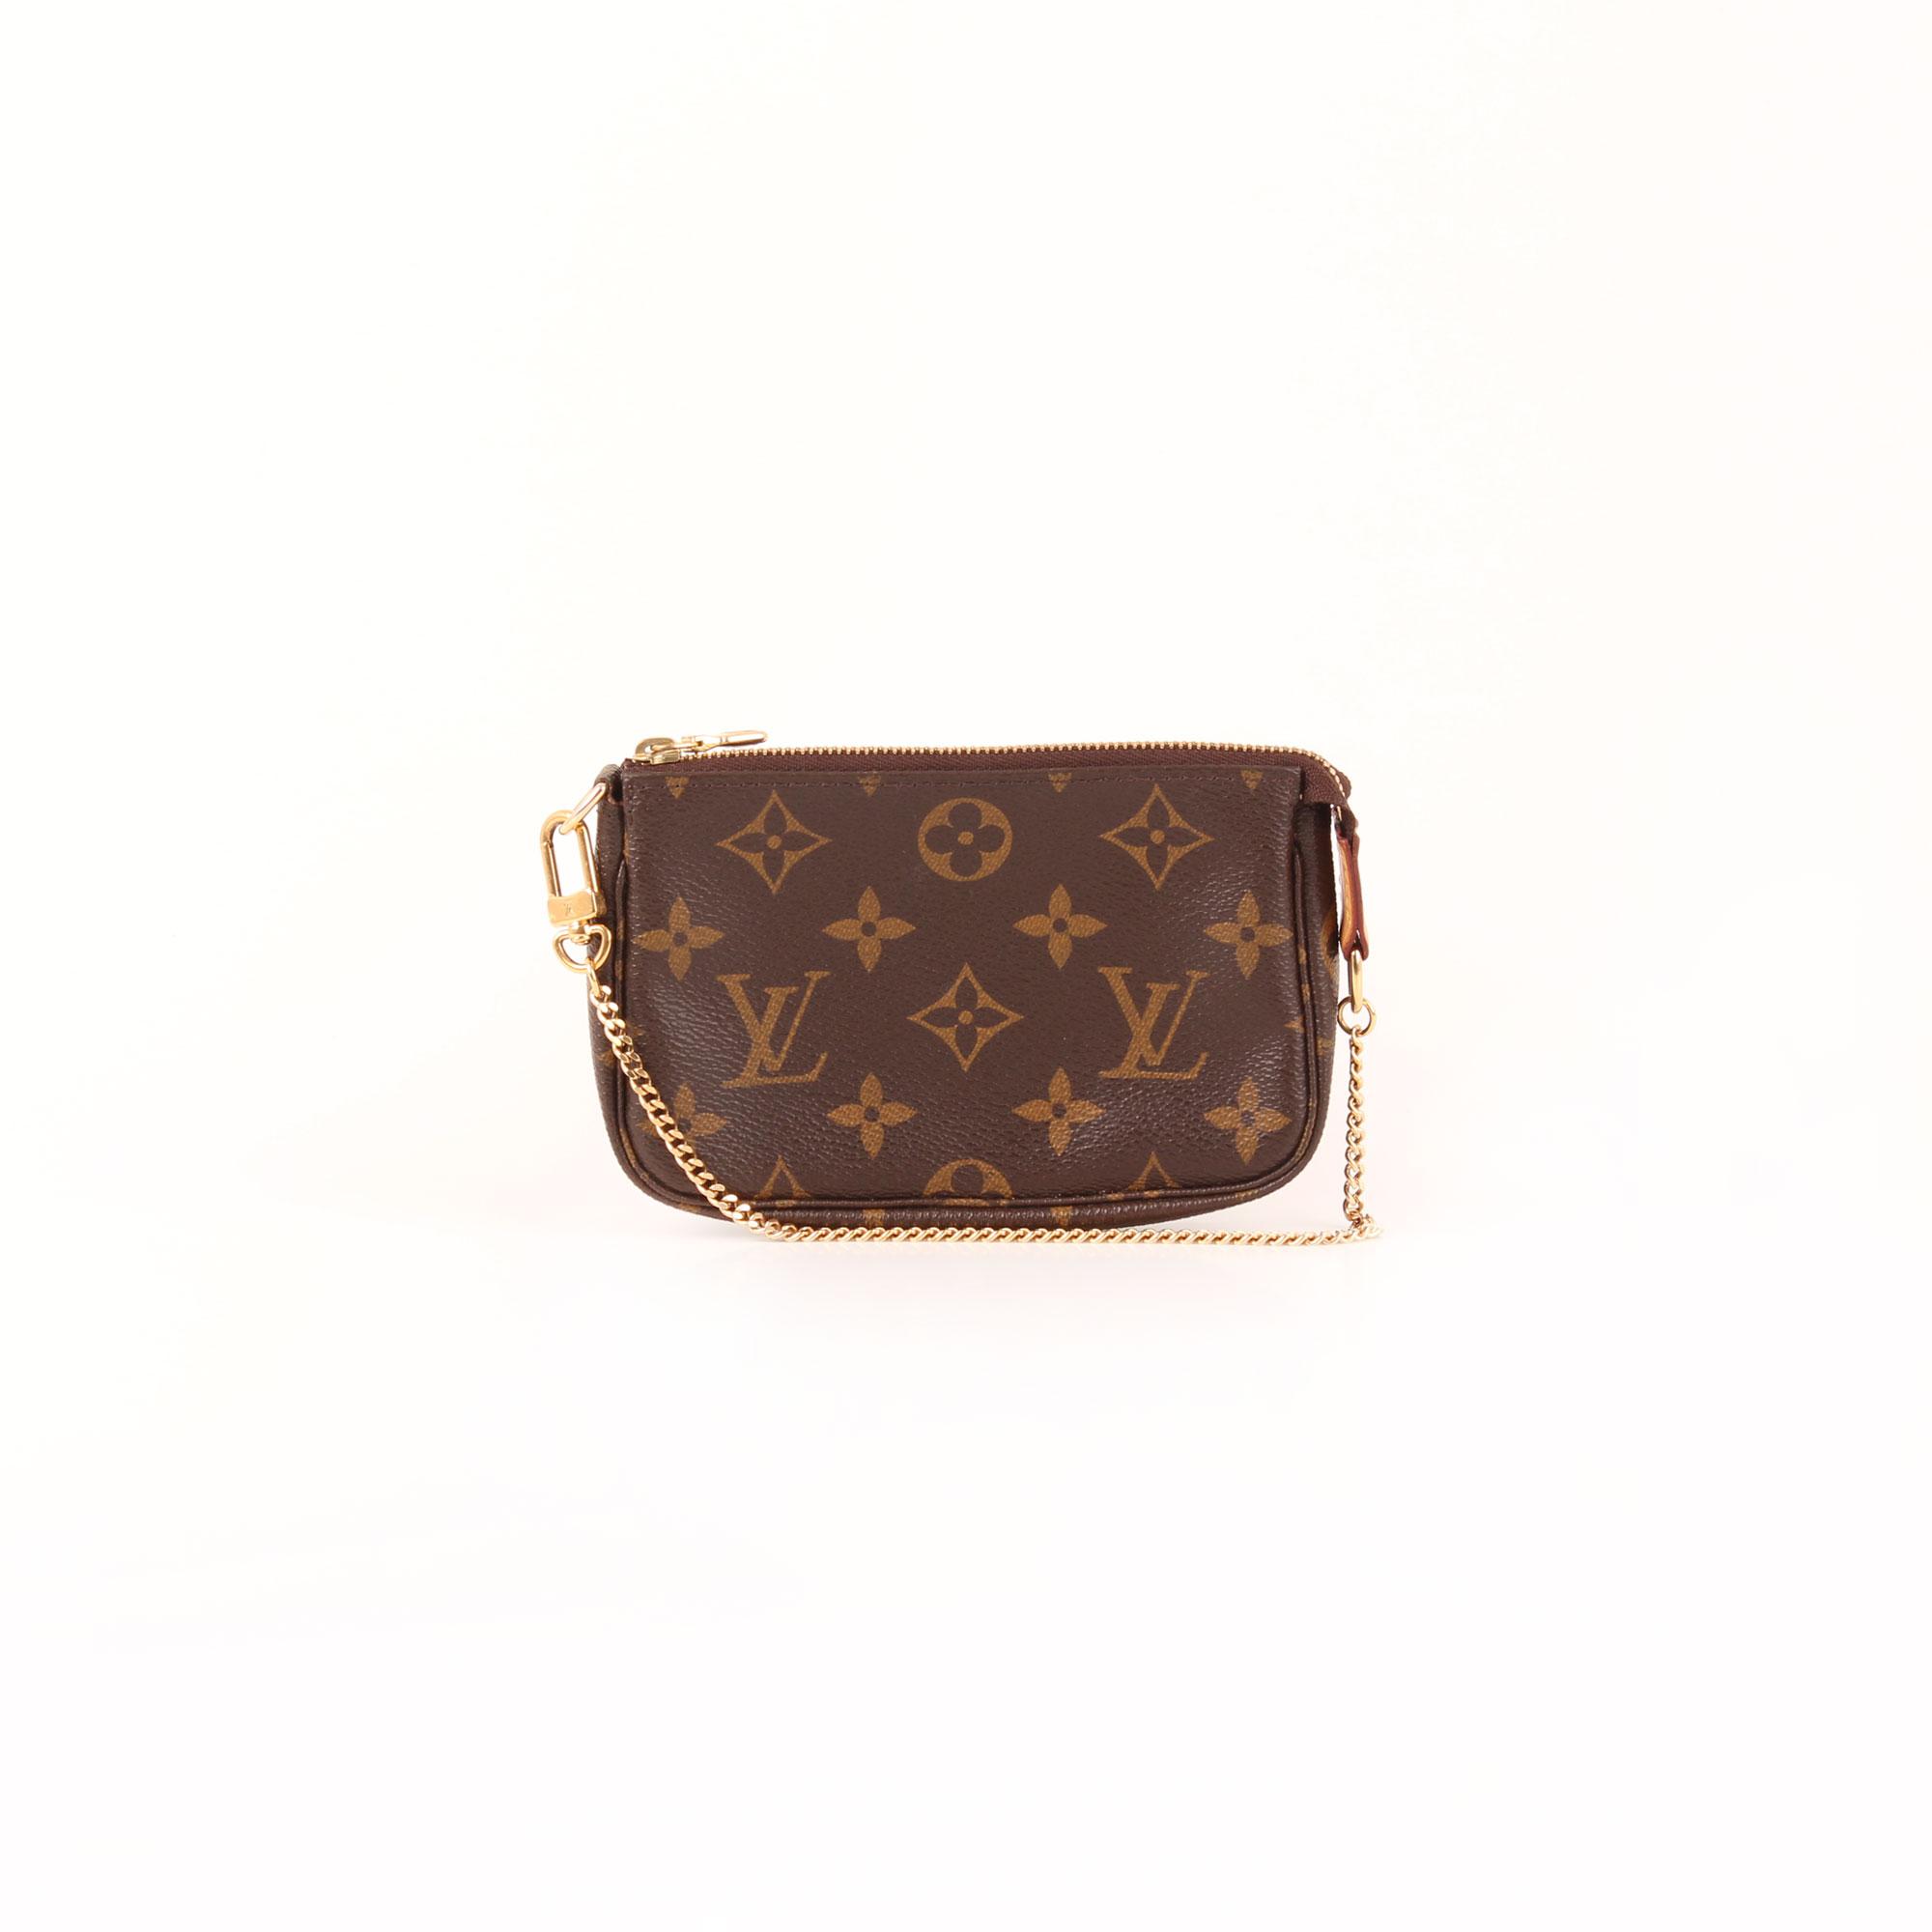 Louis Vuitton Bag Mini Pochette Accessorie Monogram